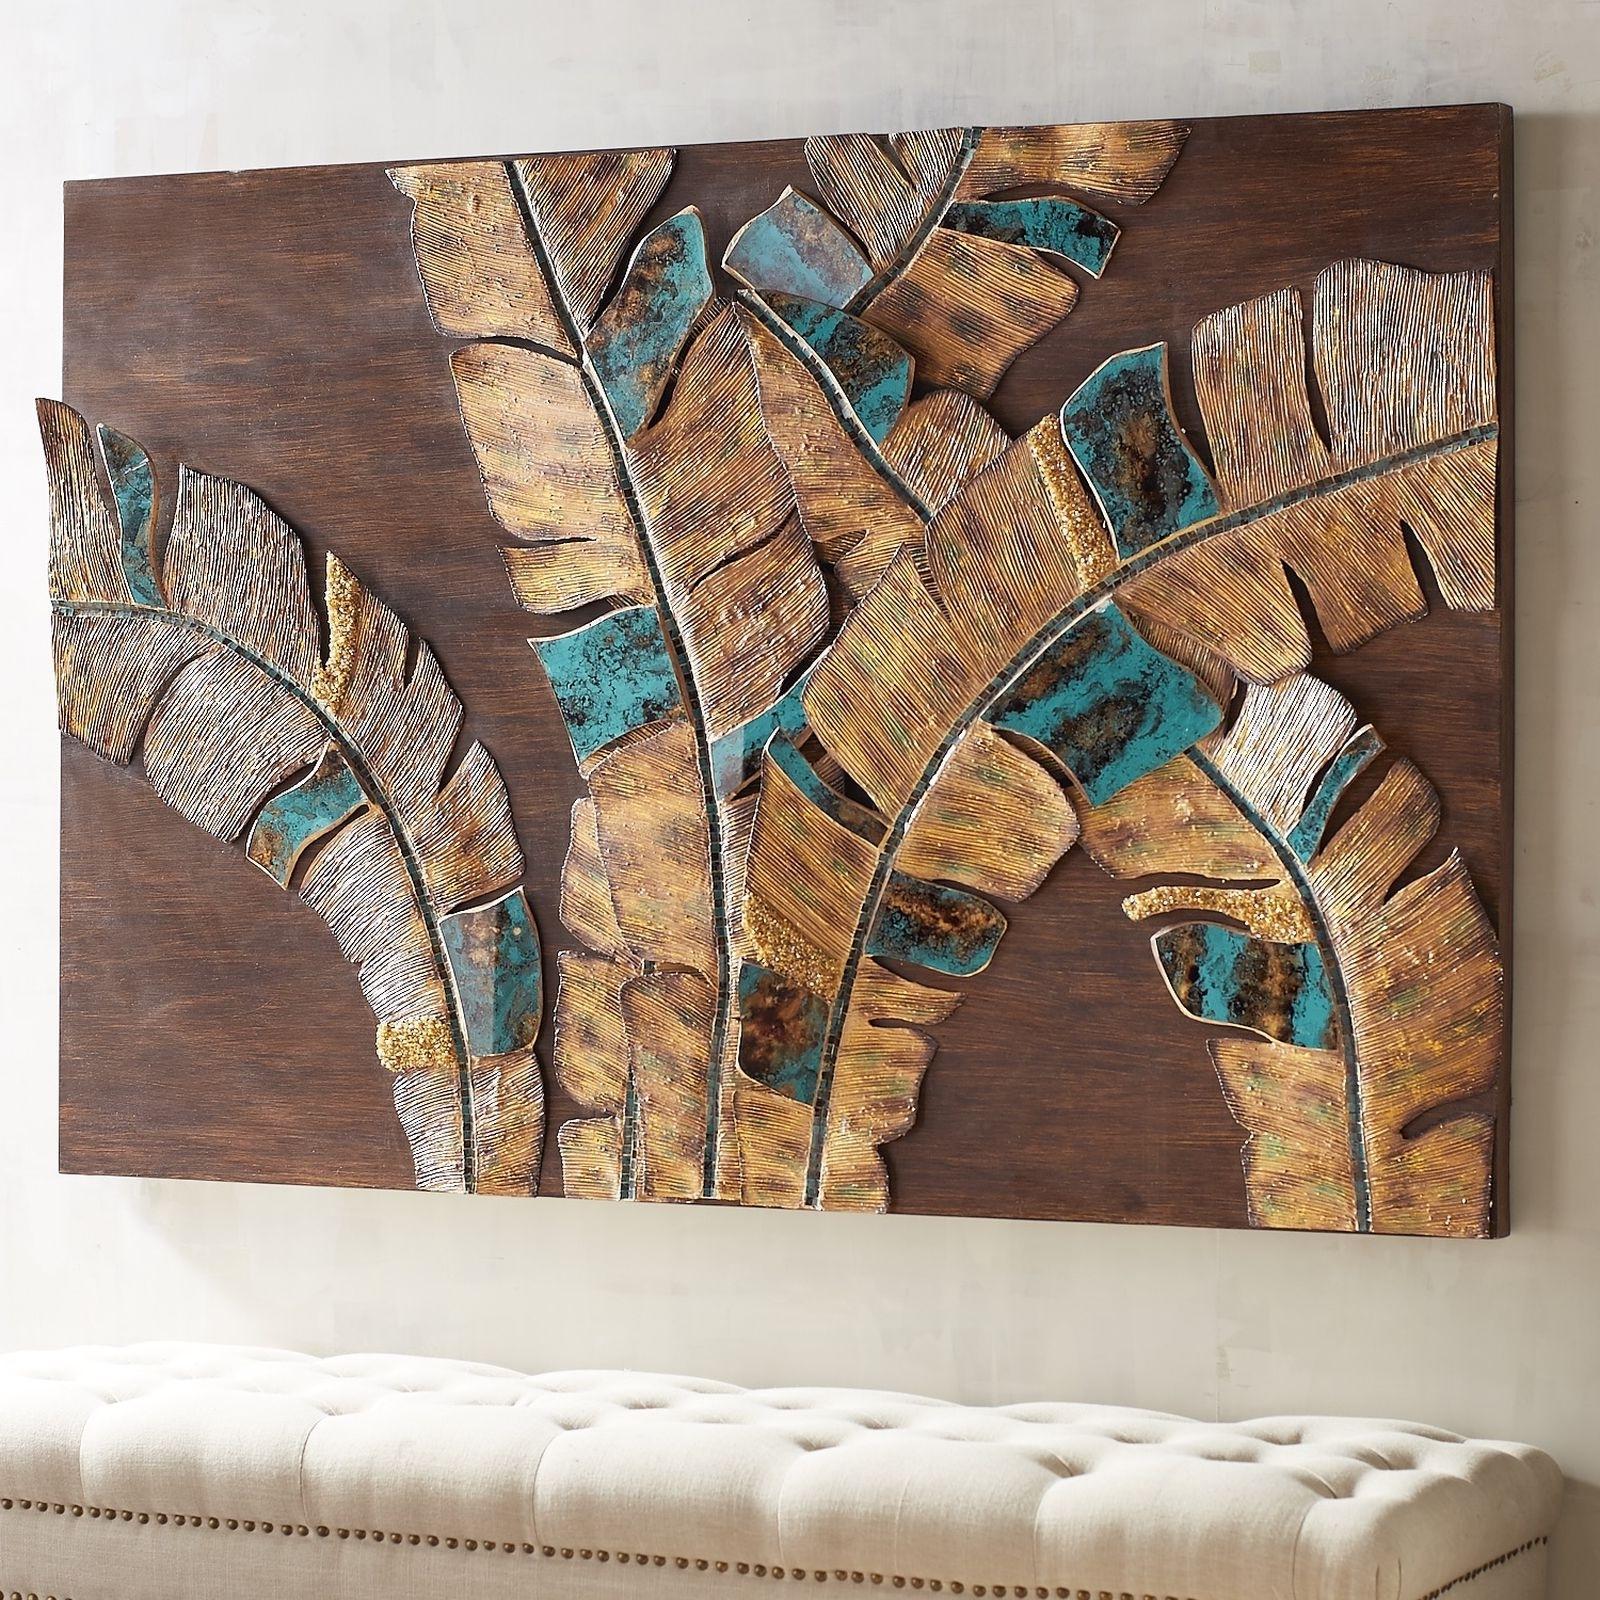 Pretentious Idea Mosaic Wall Decor Home Wallpaper Eye Diy Art Full Throughout Well Known Mosaic Wall Art (View 11 of 15)